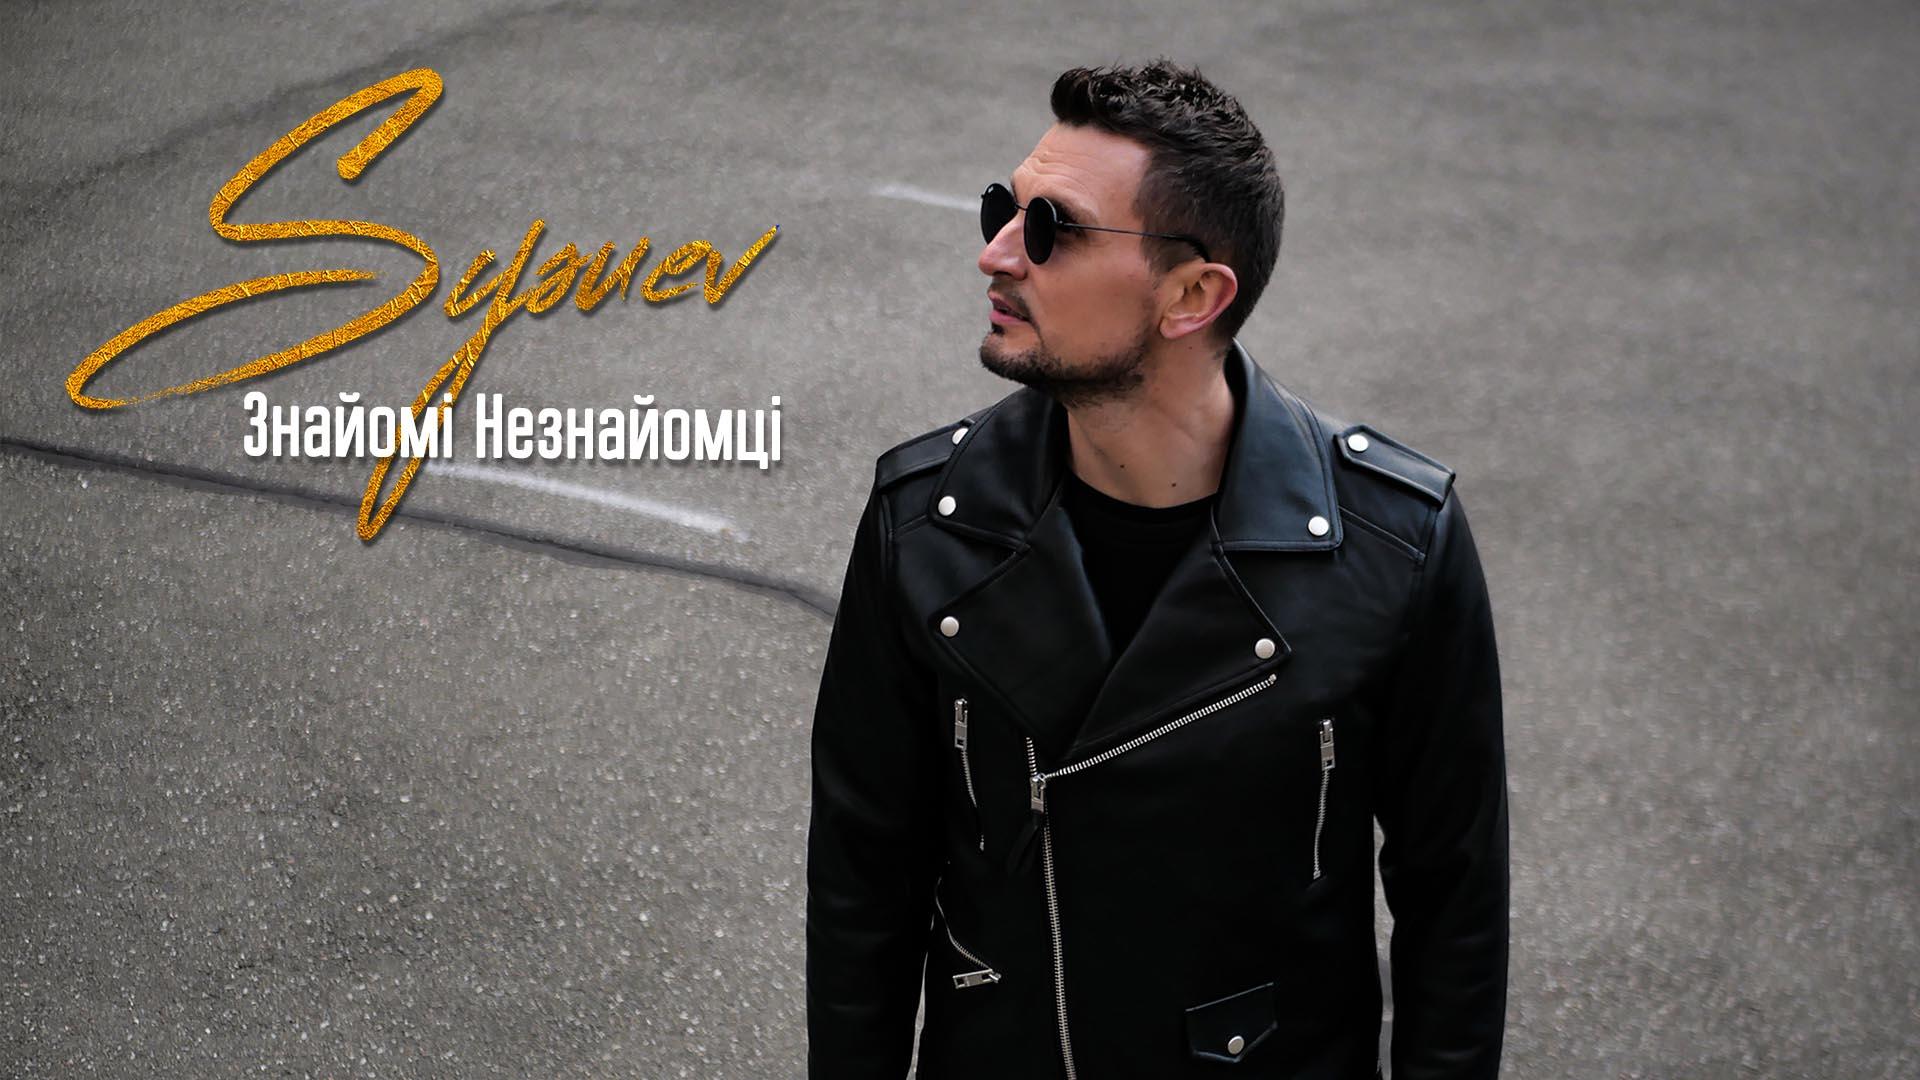 Sysuev-uamusic UA MUSIC | Енциклопедія української музики